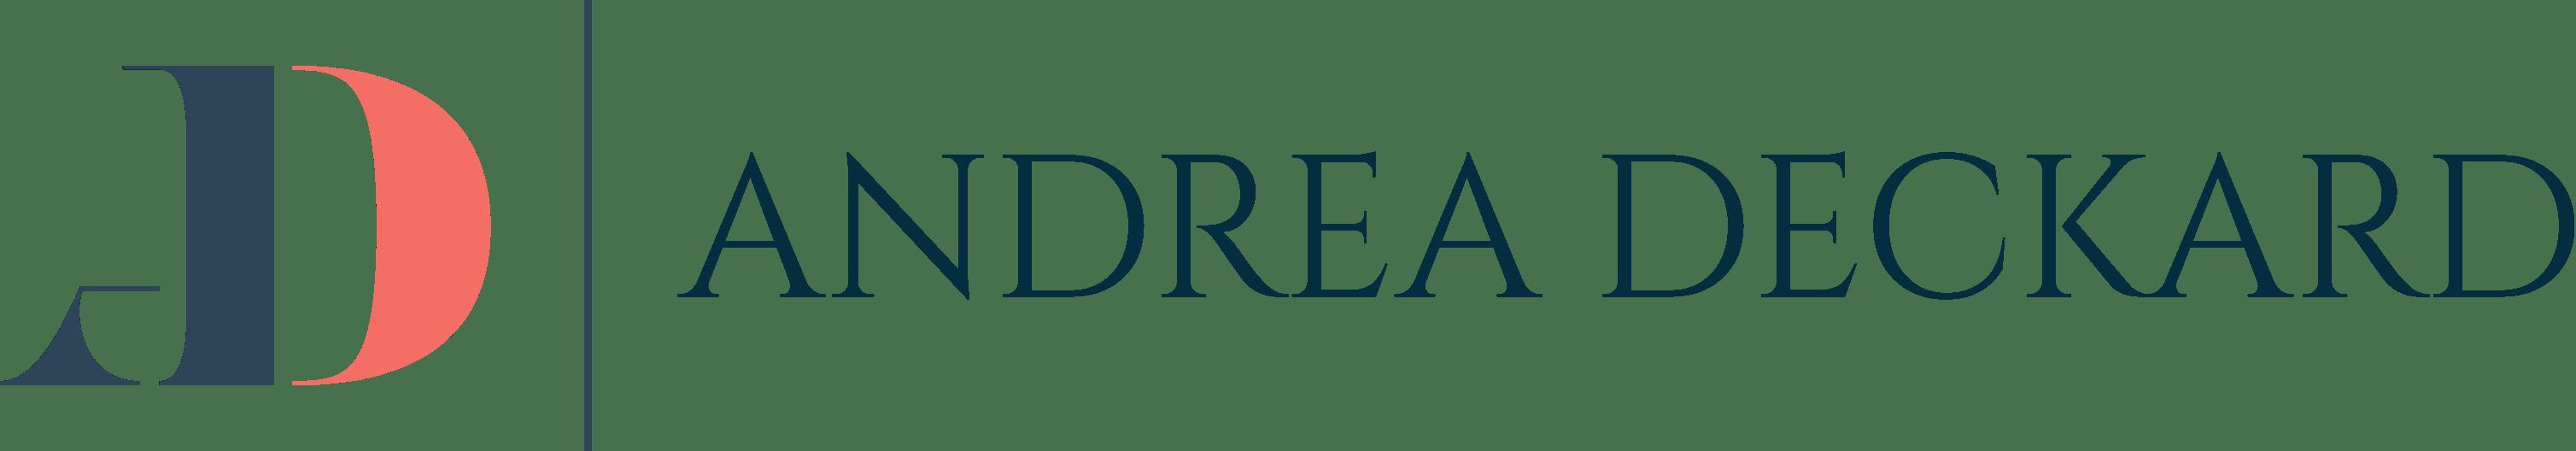 Andrea Deckard